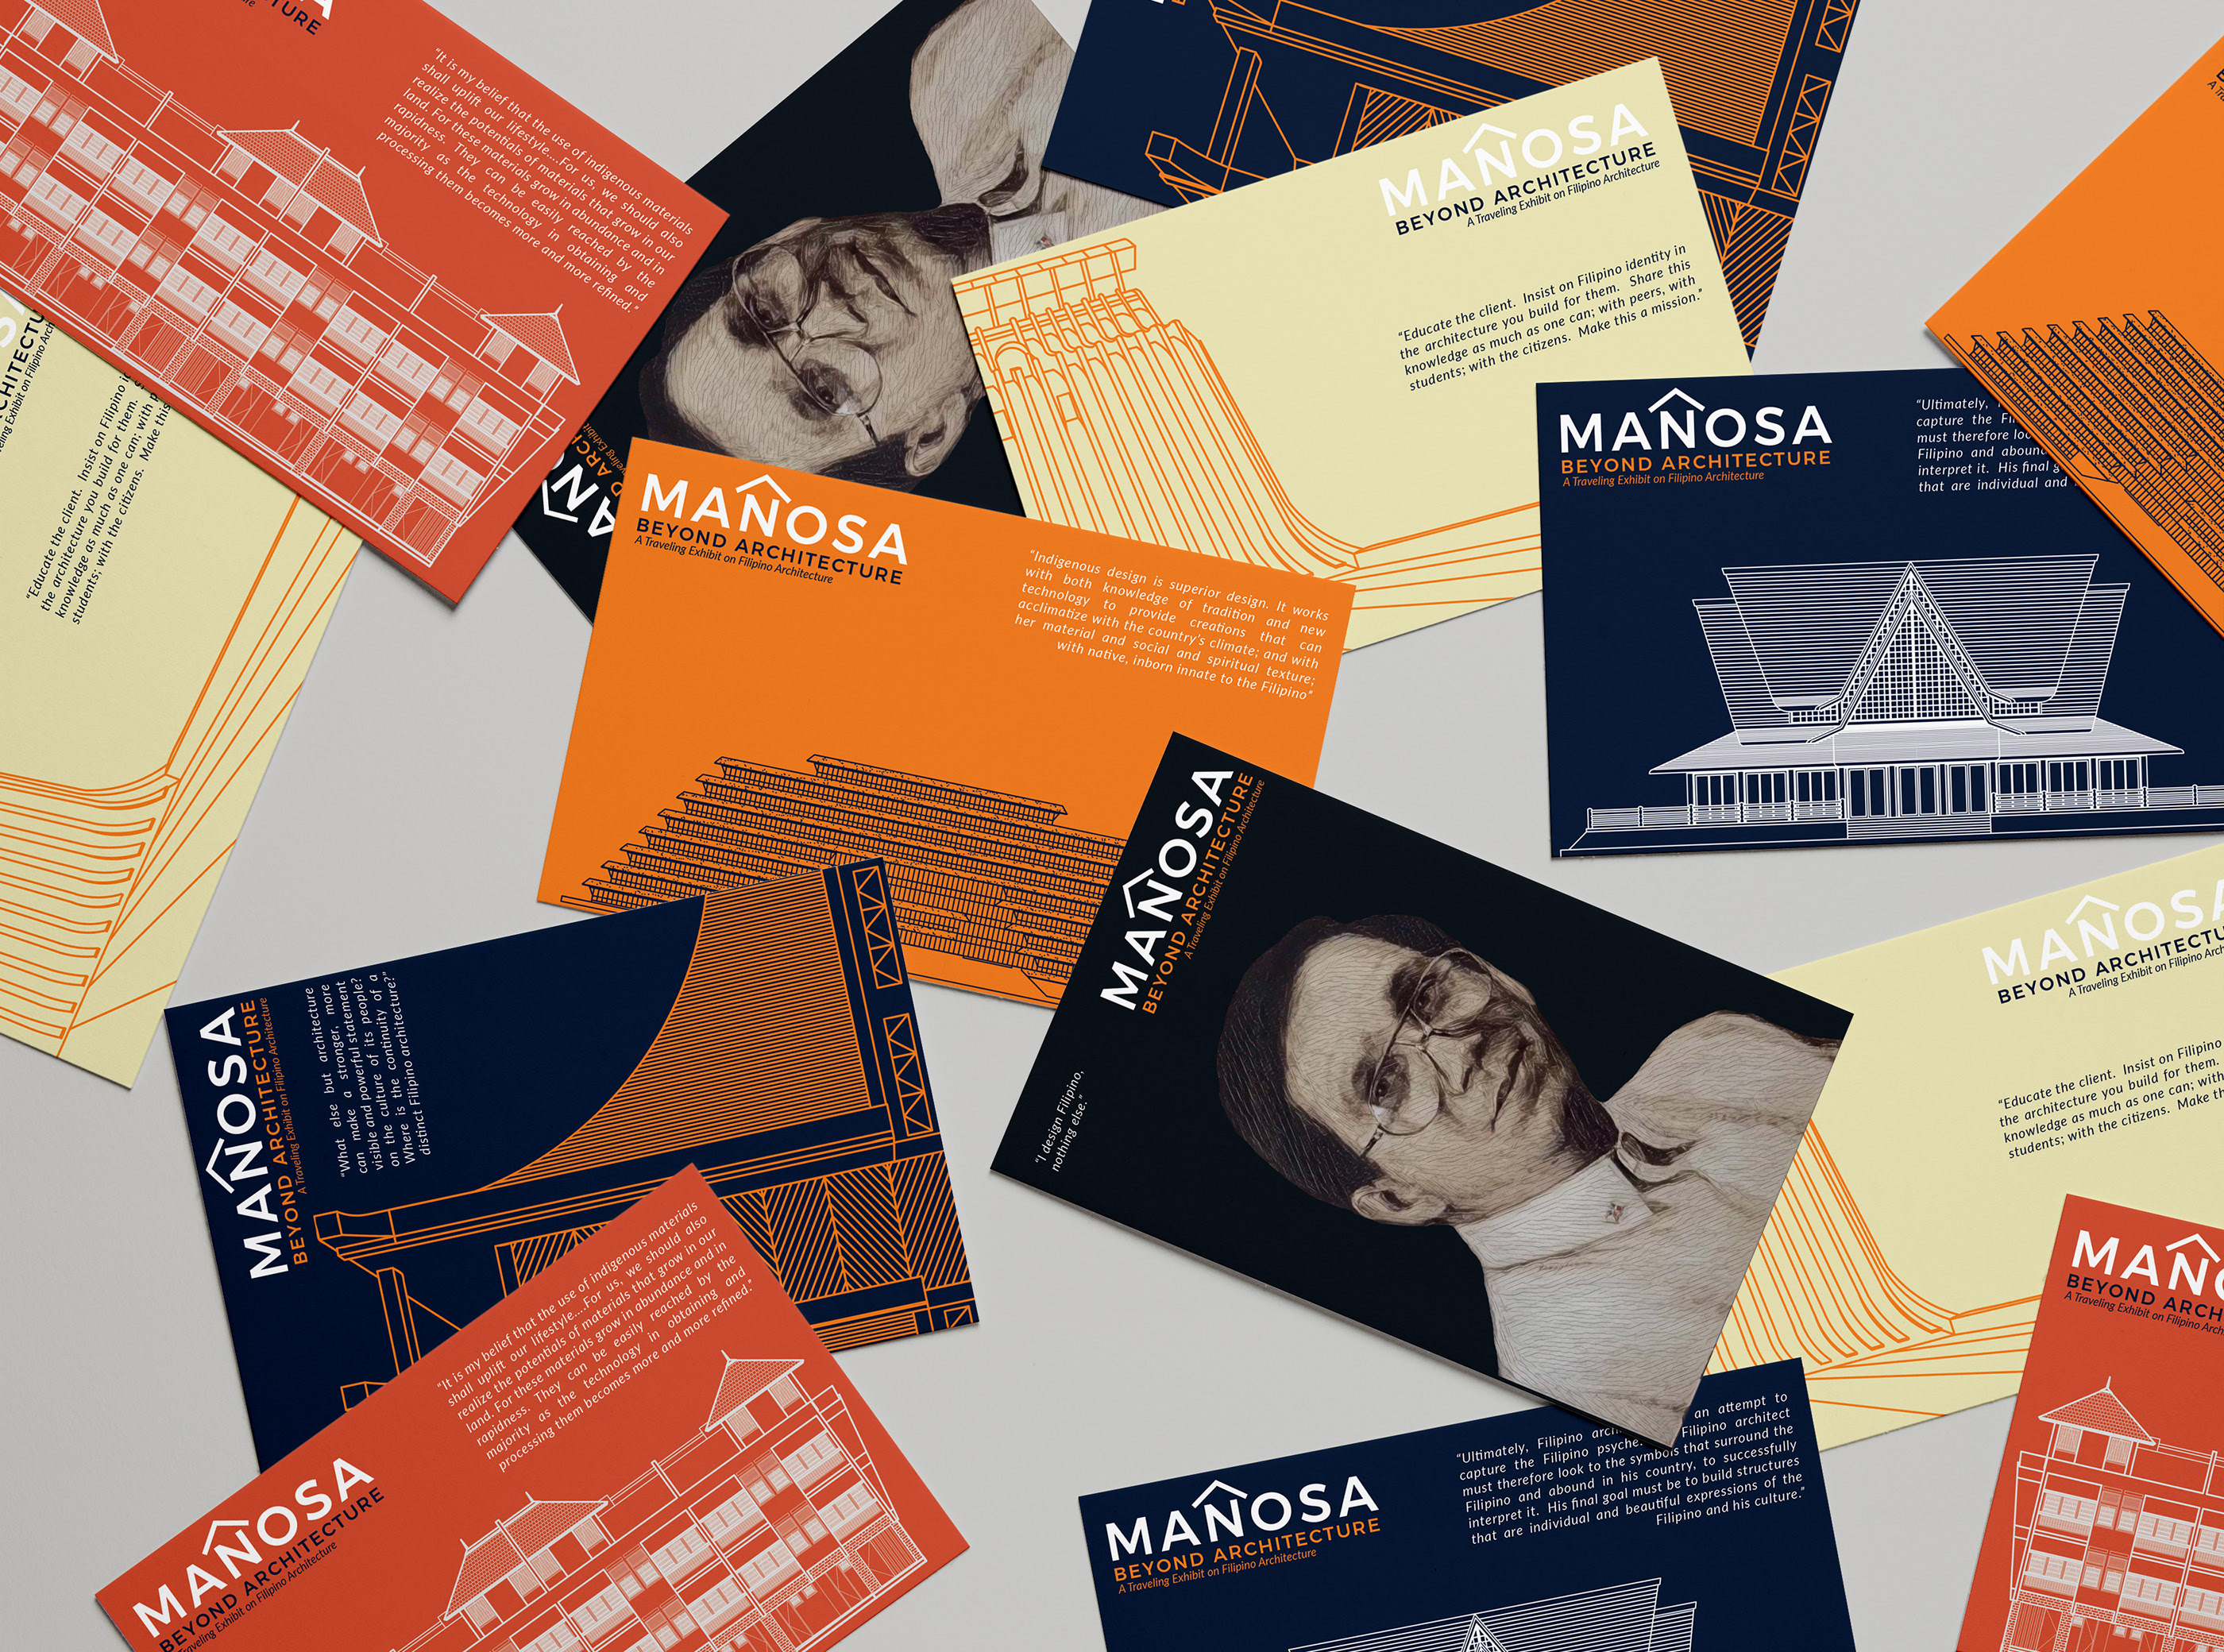 Mañosa: Beyond Architecture Exhibit on Behance